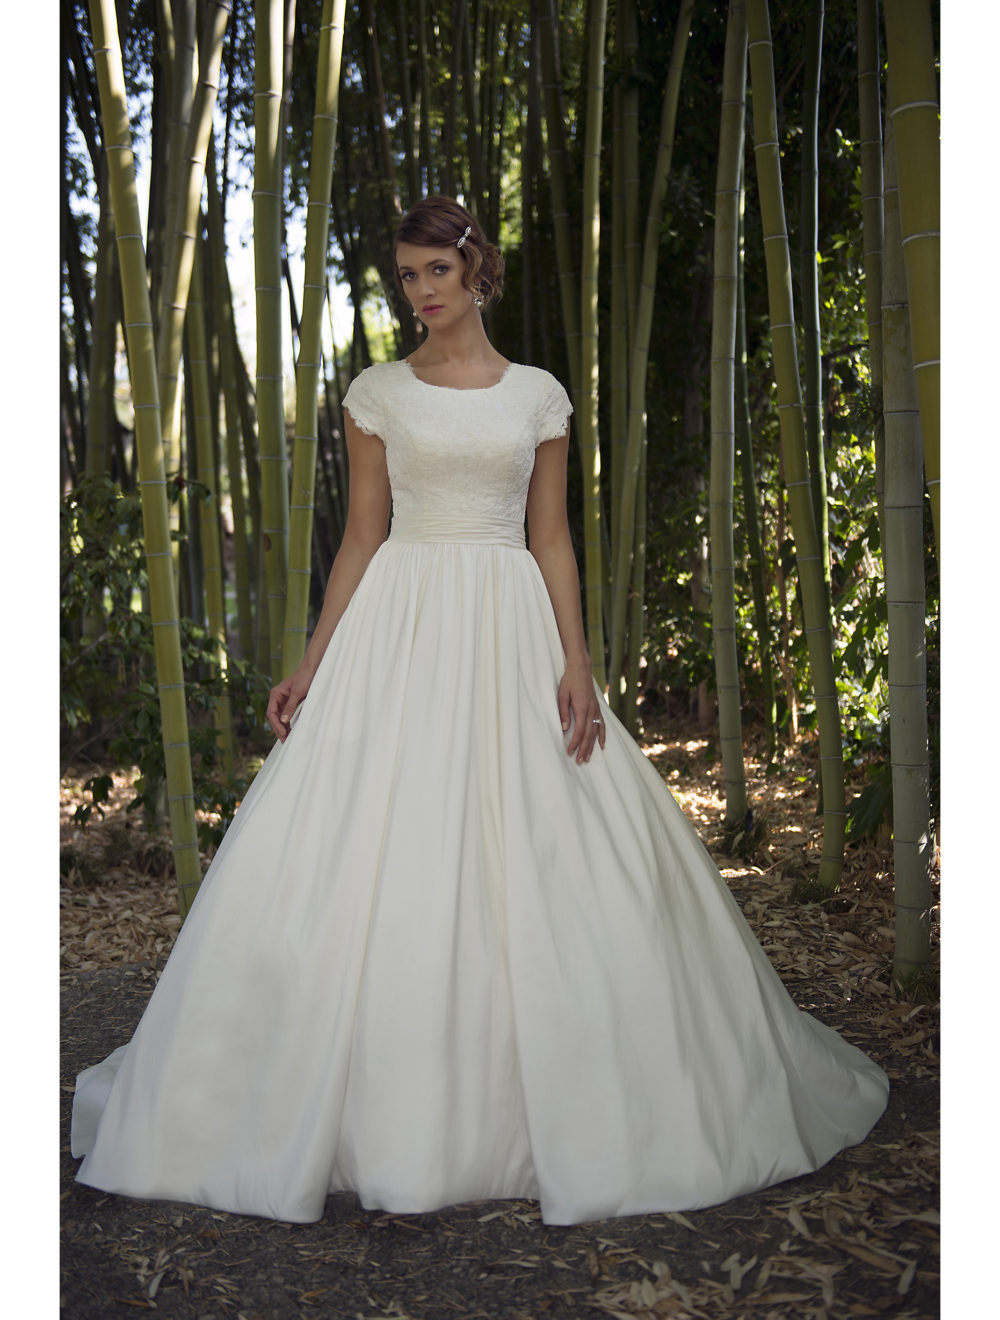 Outstanding Vestidos De Novia Simples Component - Wedding Dress ...